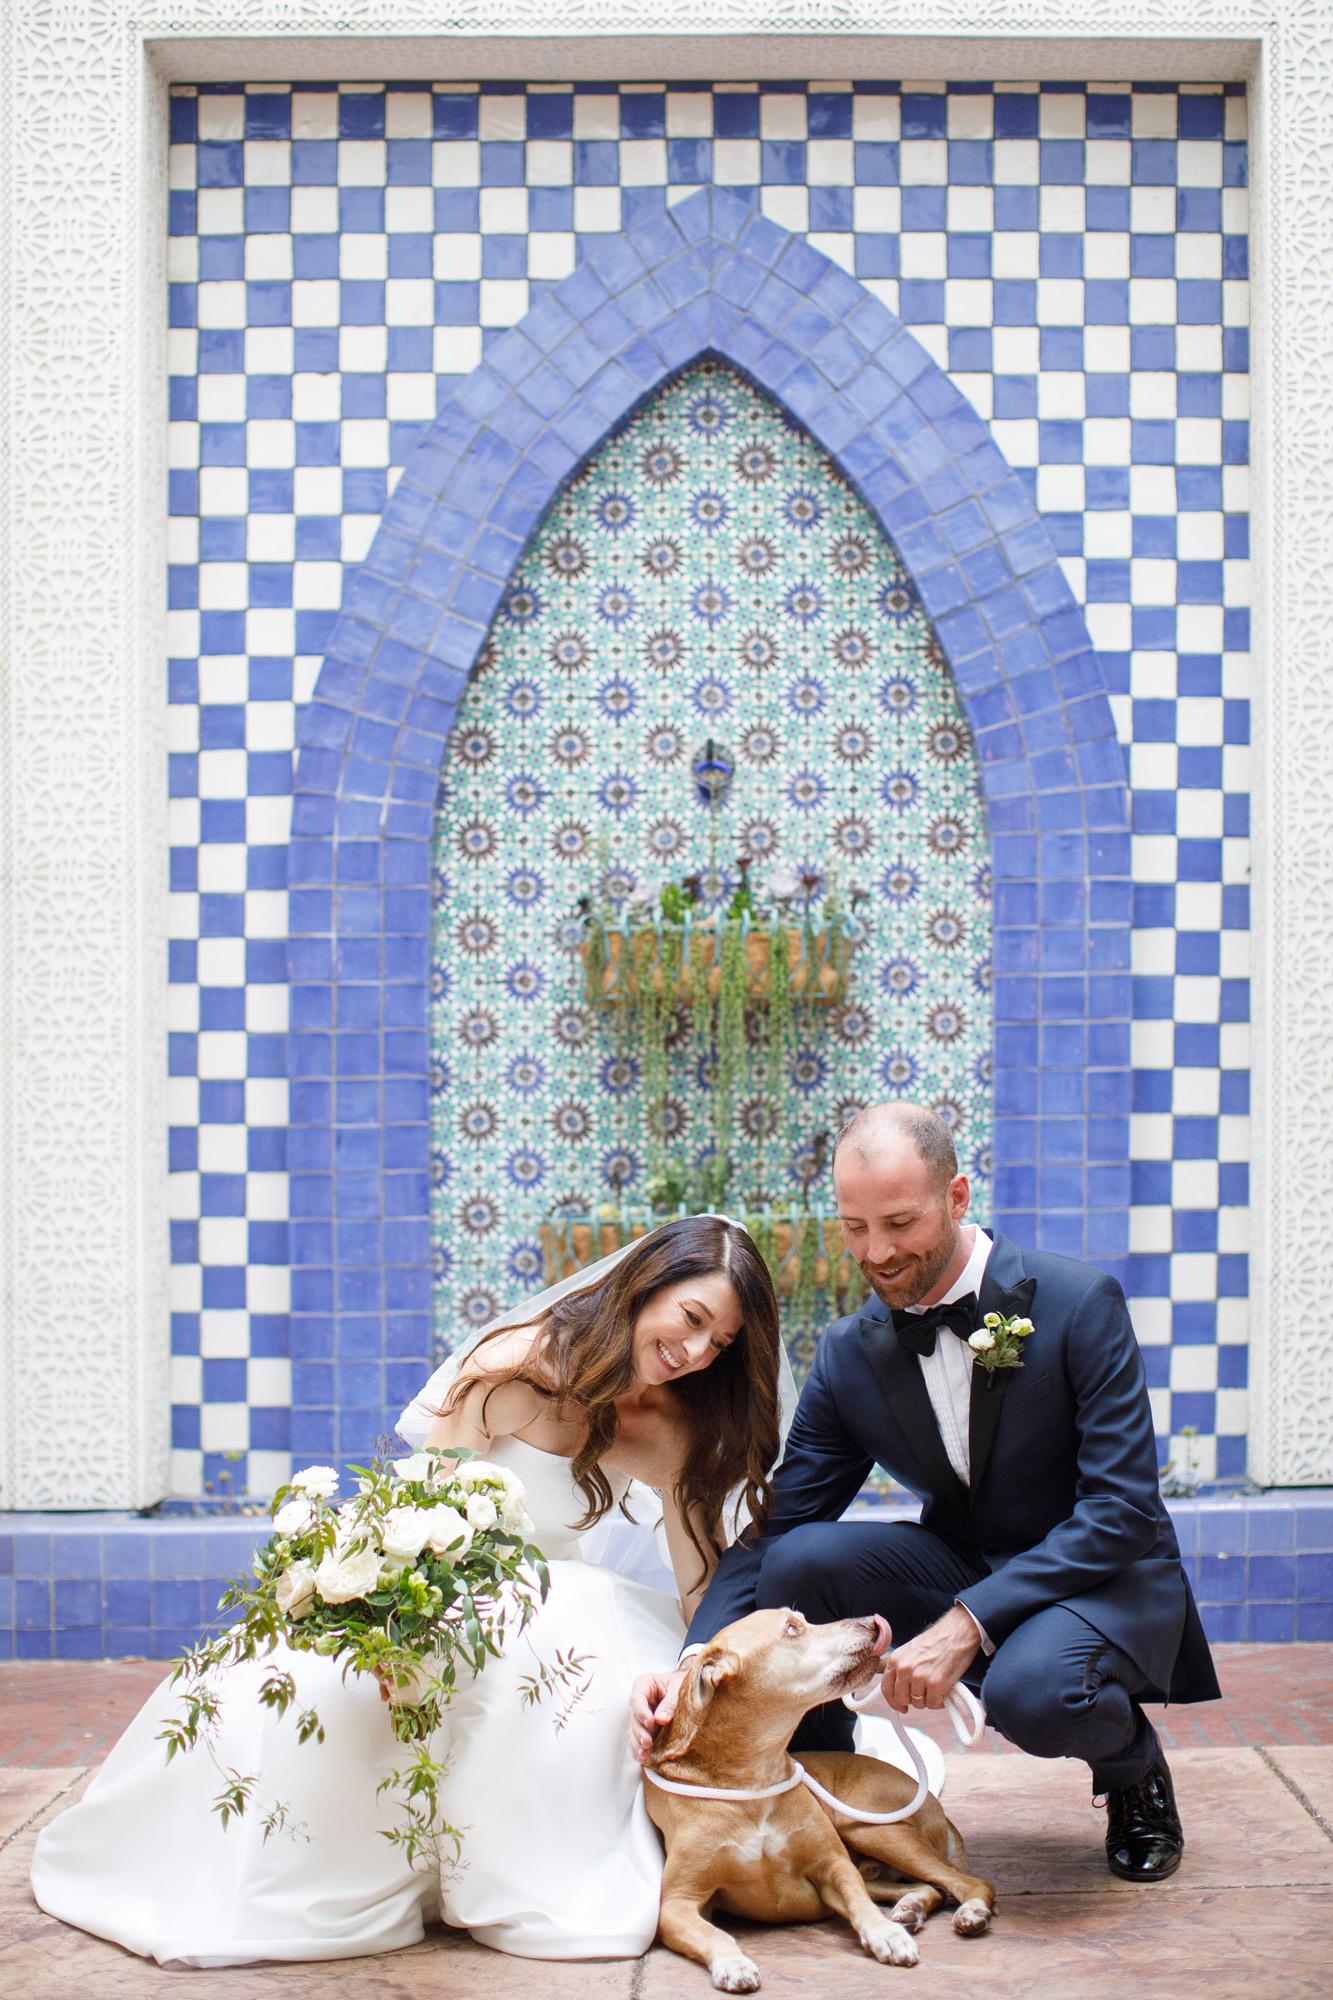 www.santabarbarawedding.com | Kiel Rucker | Canary Hotel | Bride and Groom and Dog